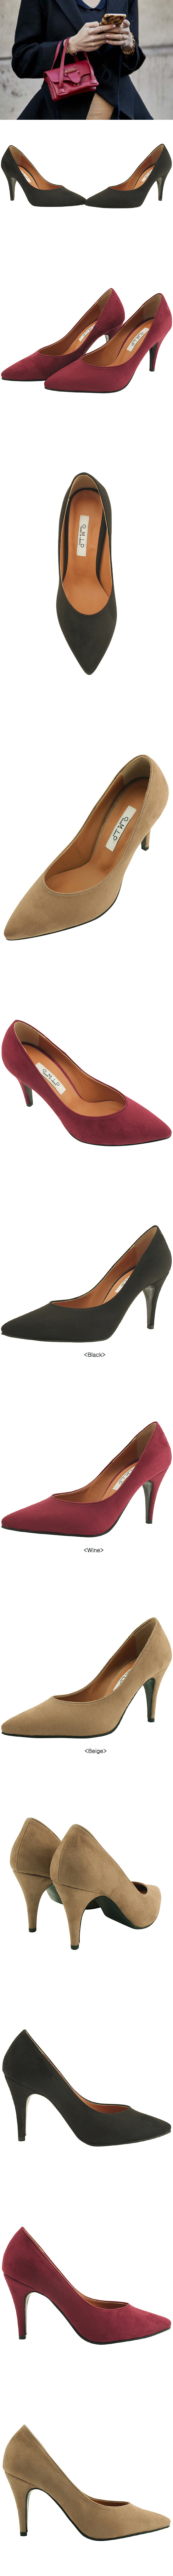 Simple Suede Stiletto Heel 9cm Black